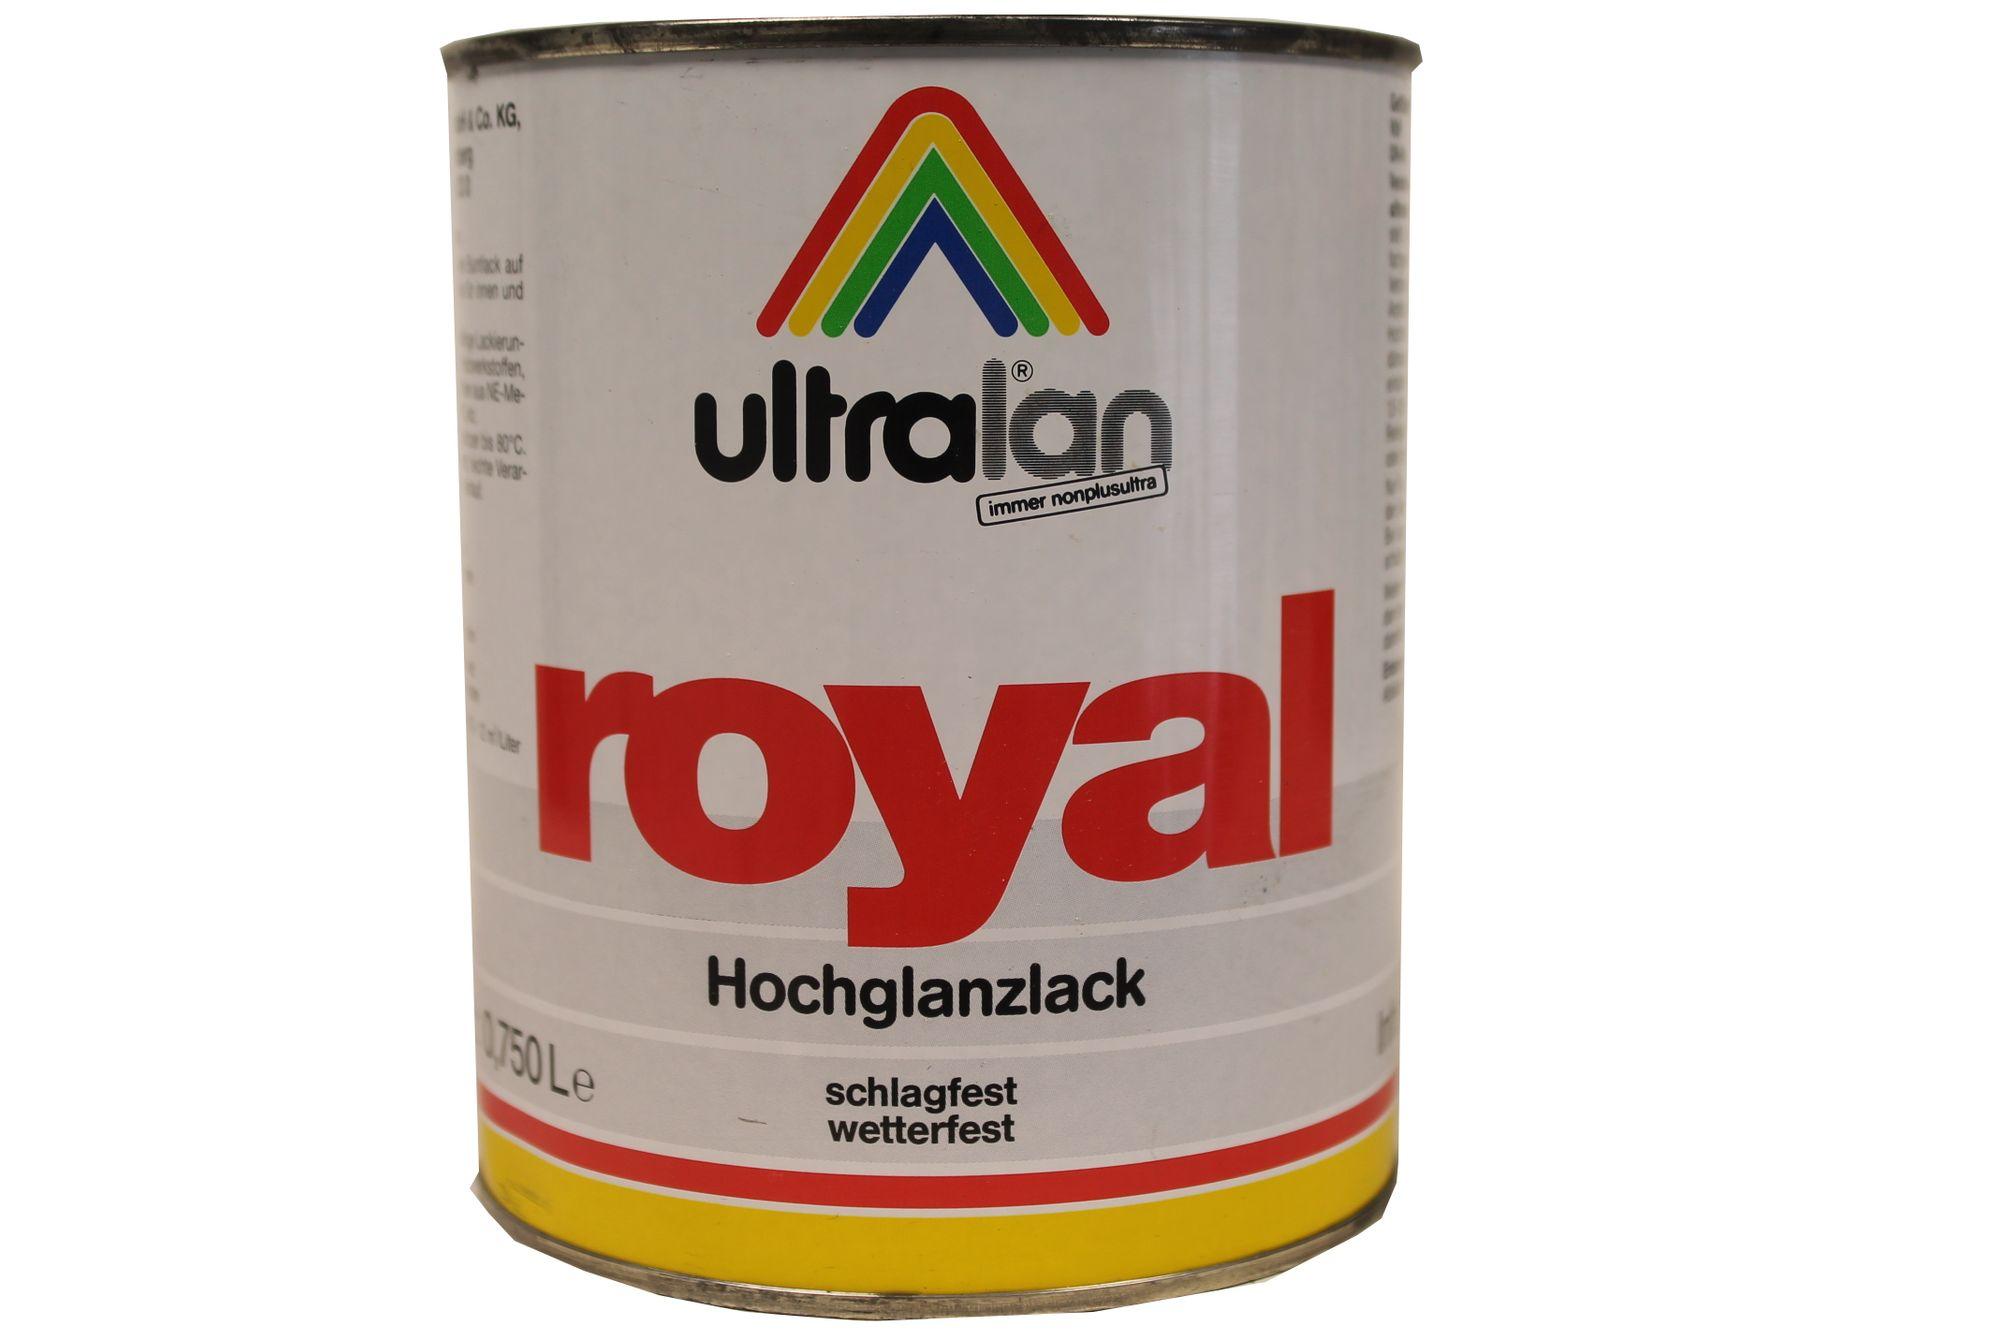 Ultralan Royal Hochglanzlack innen/außen lösemittelhaltig 2,5 Liter Farbwahl